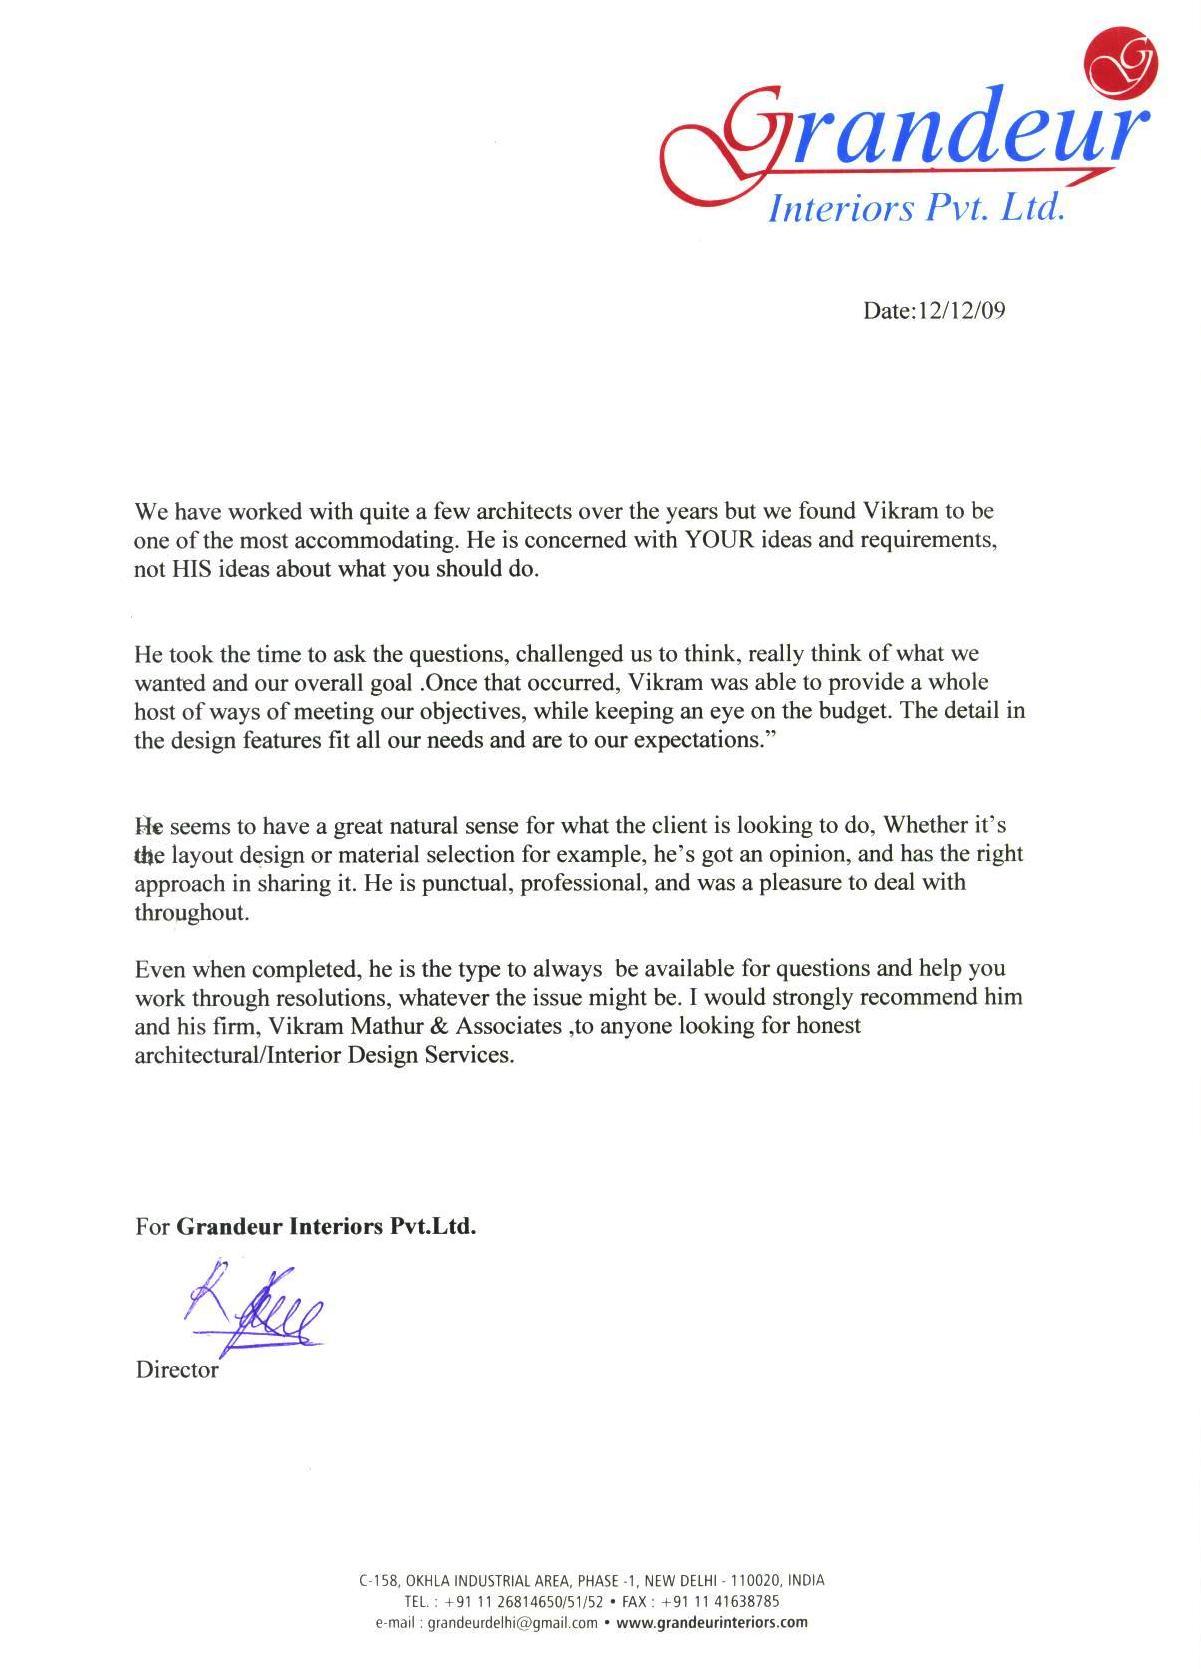 reviews for vikram mathur s work architect reviews